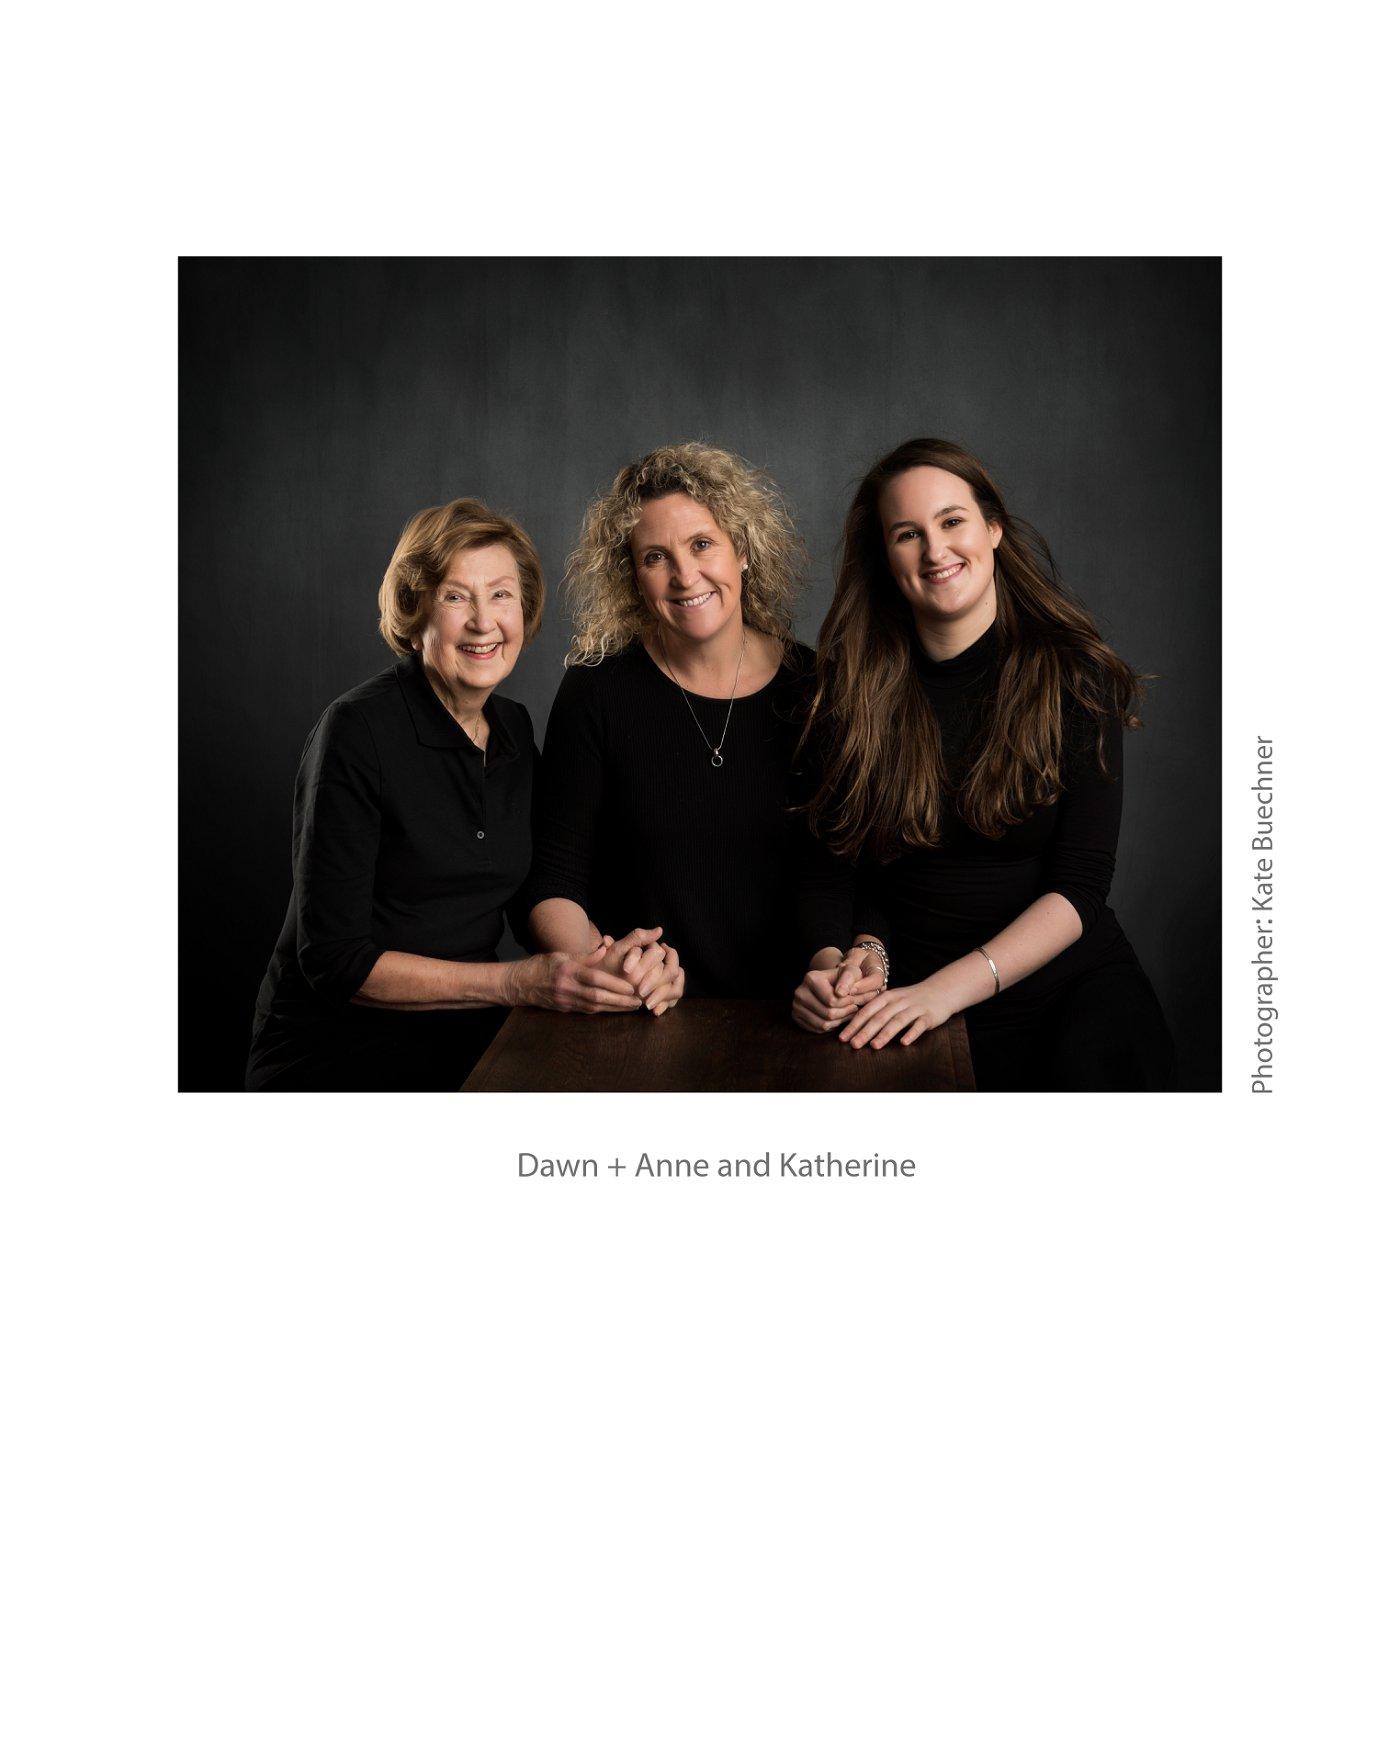 family-photographer-northshore (7).jpg